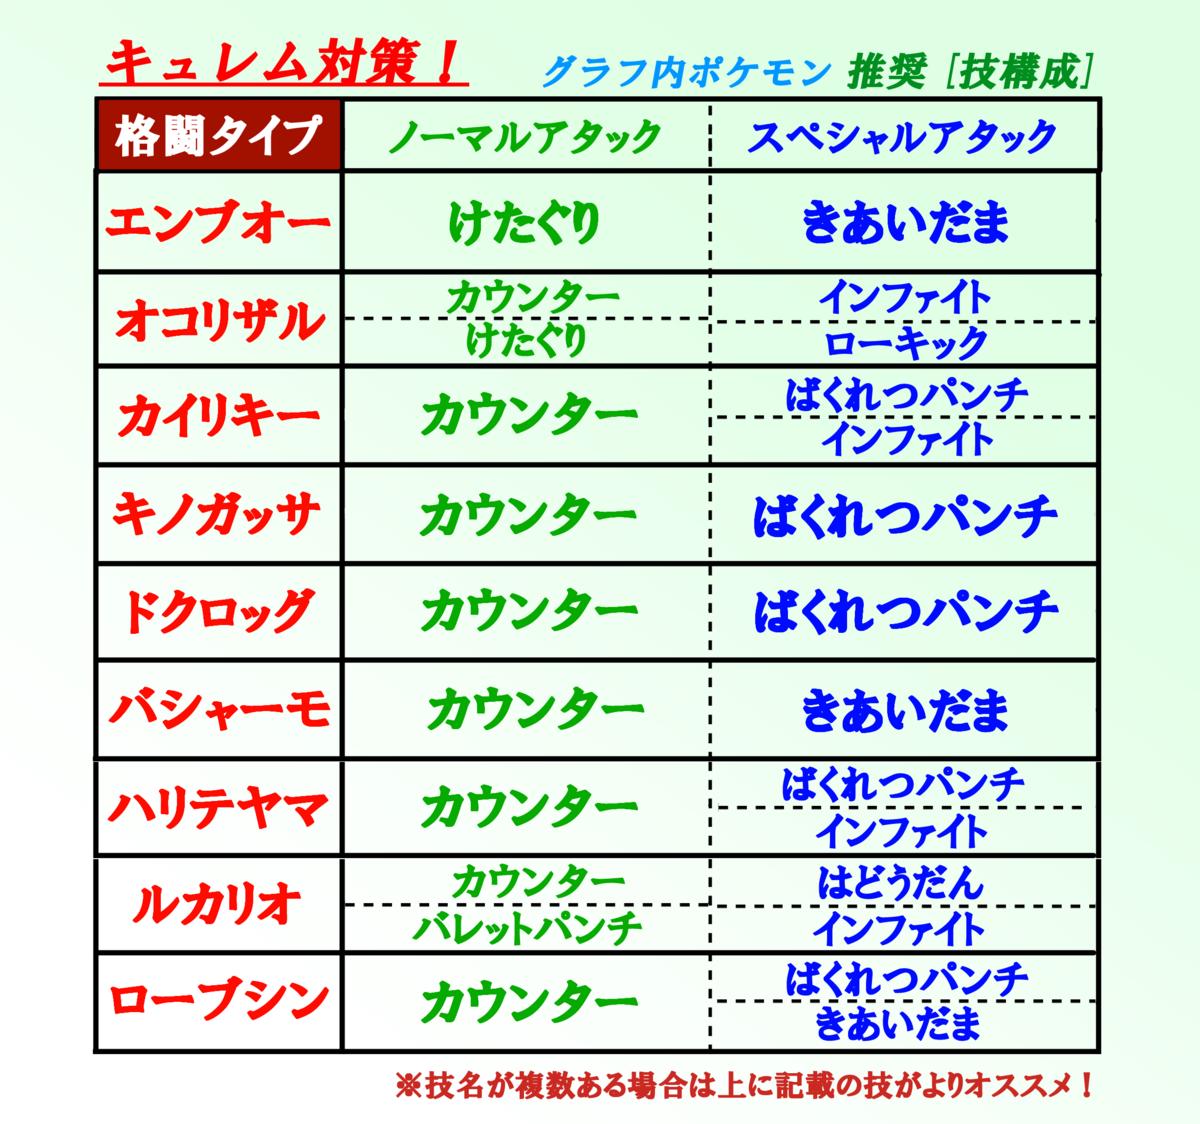 f:id:Kazumin0331:20200703004229p:plain